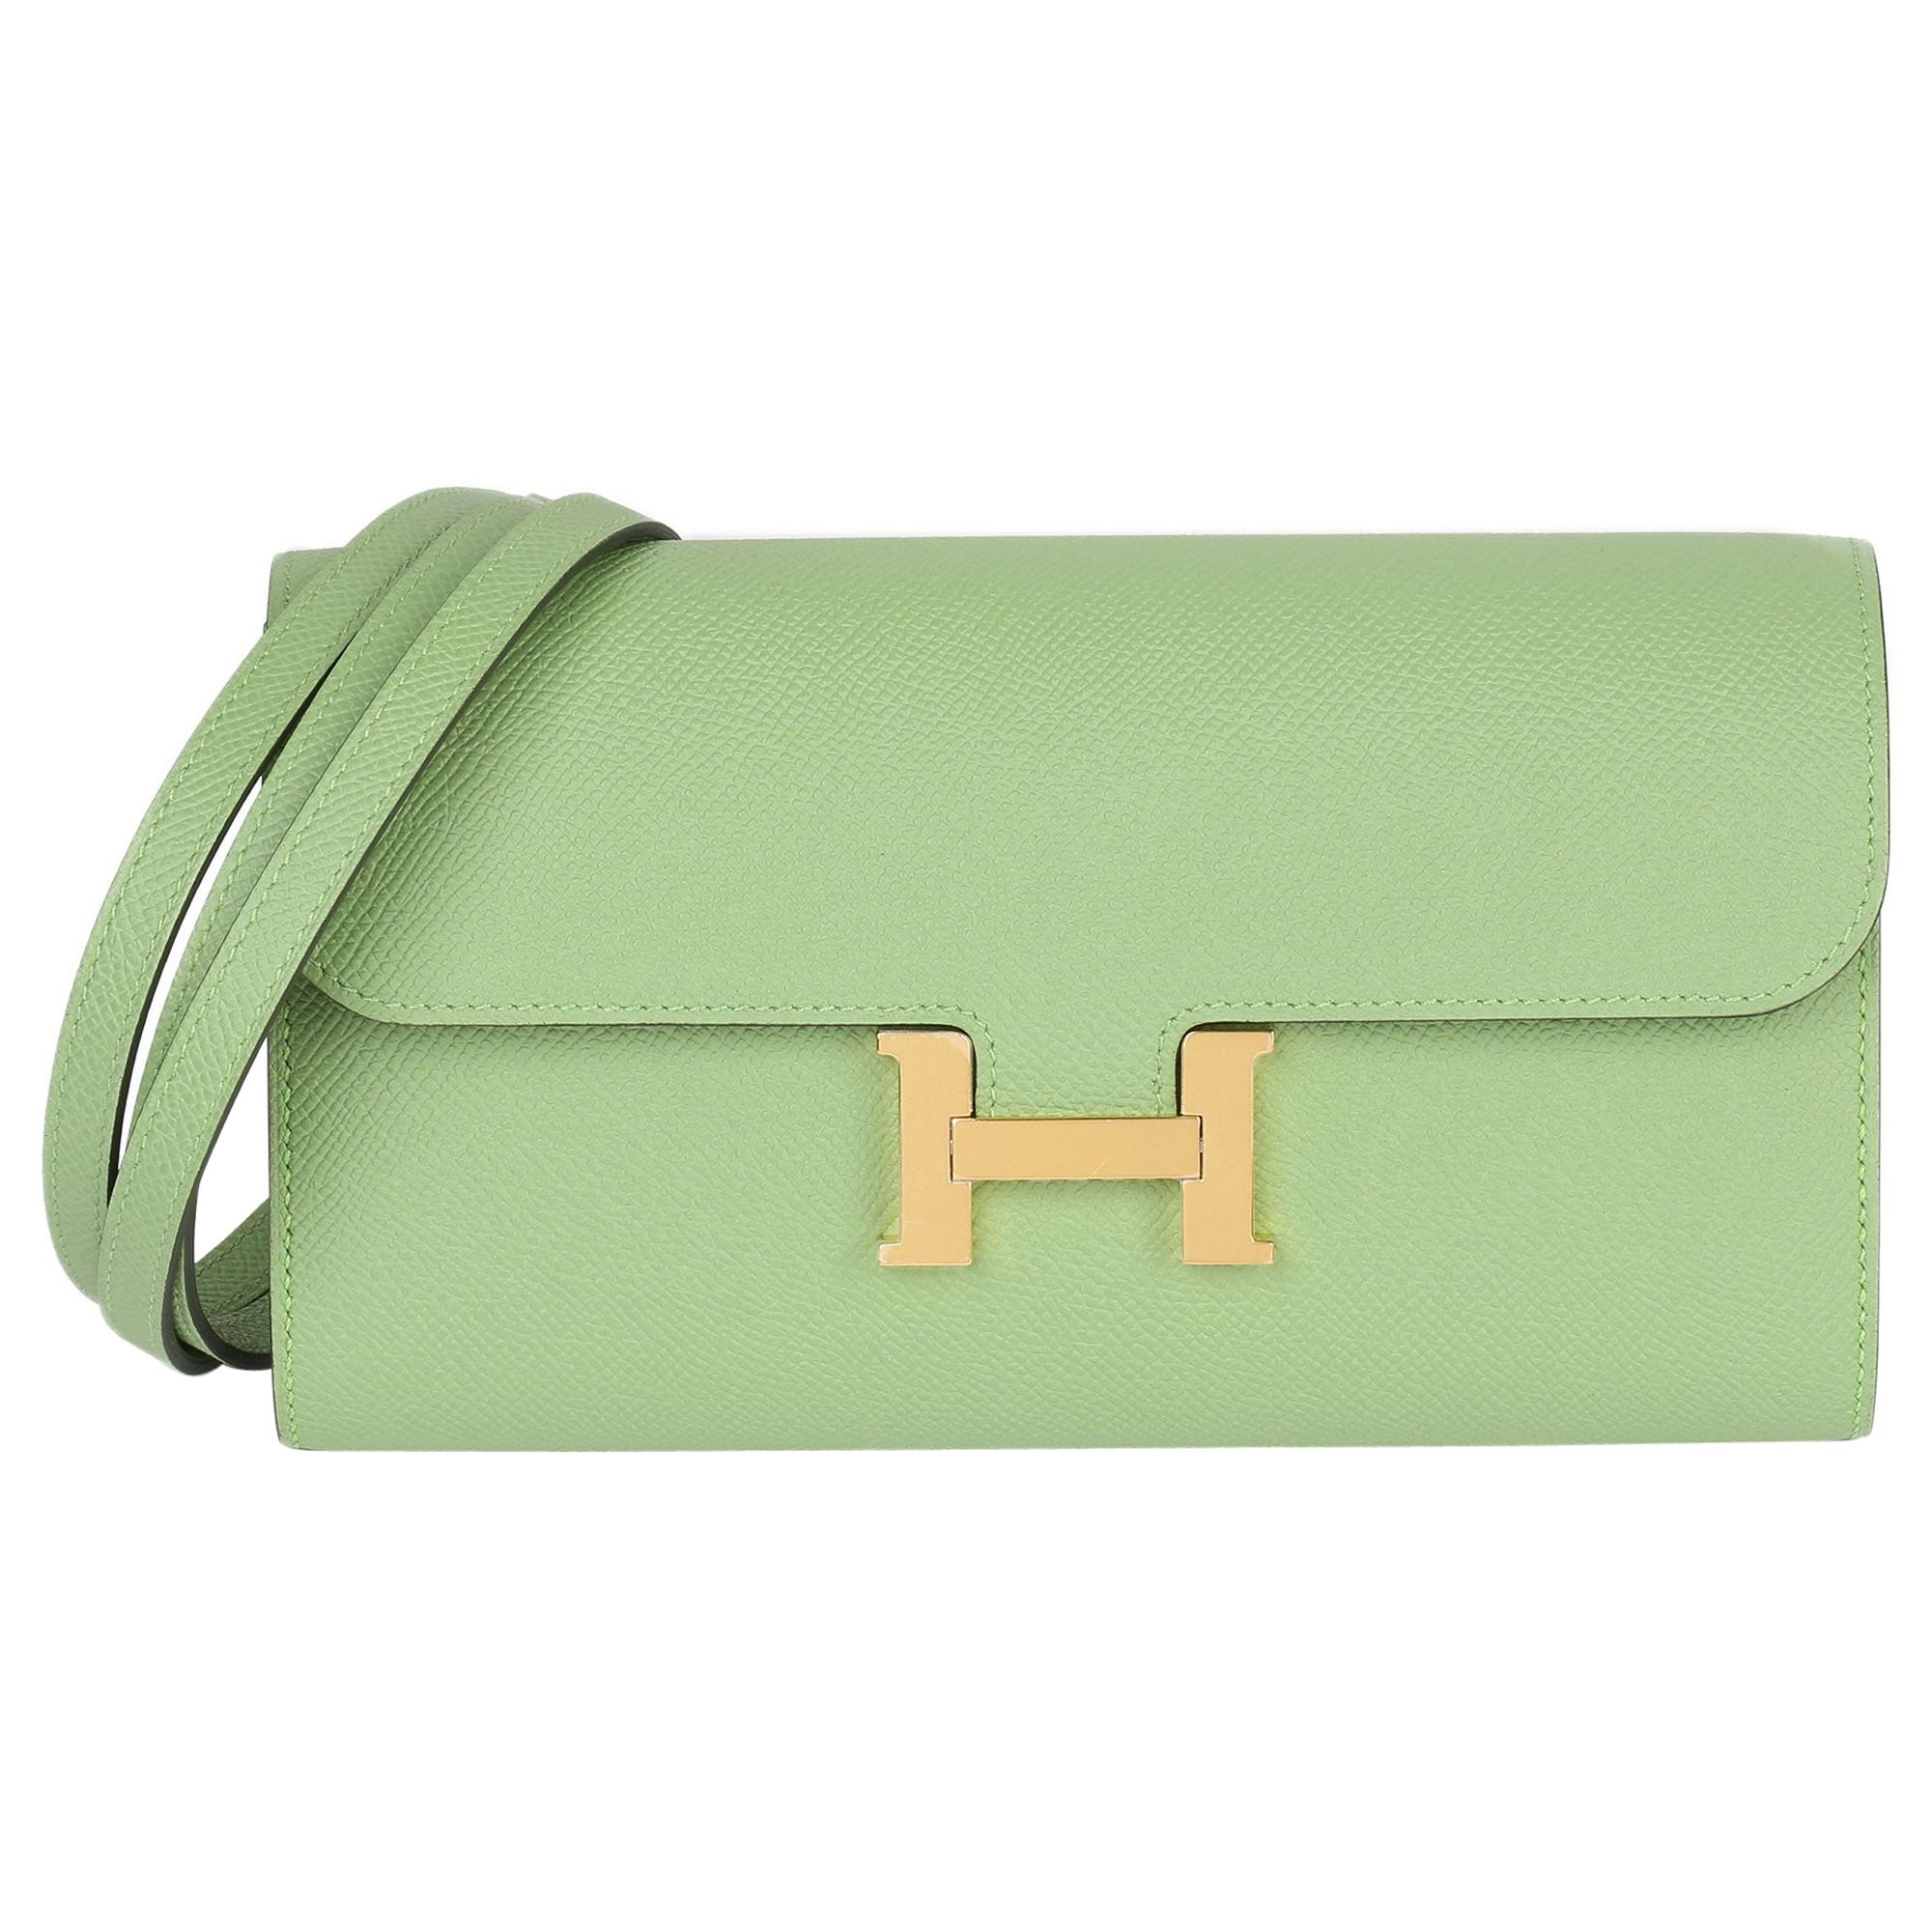 2020 Hermes Vert Criquet Epsom Leather Constance To Go Long Wallet